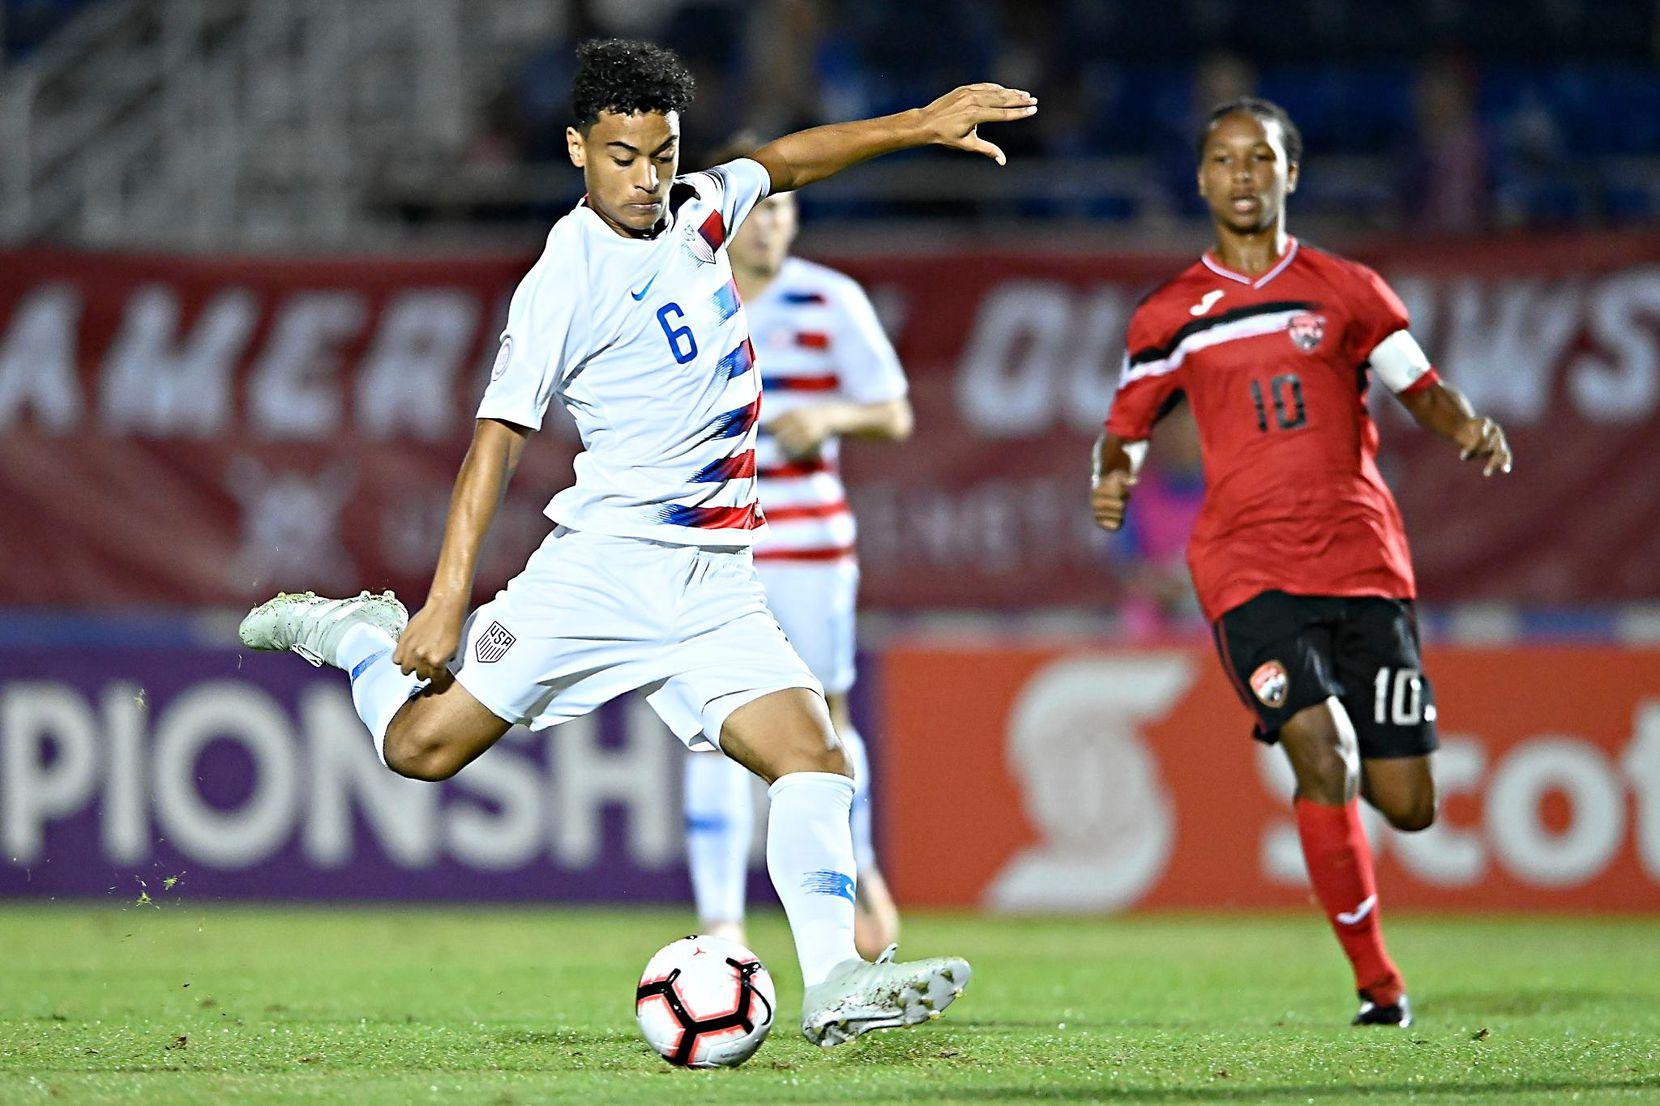 Brandon Servania of FC Dallas playing in the 2018 Concacaf U20 Championship against Trinidad and Tobago